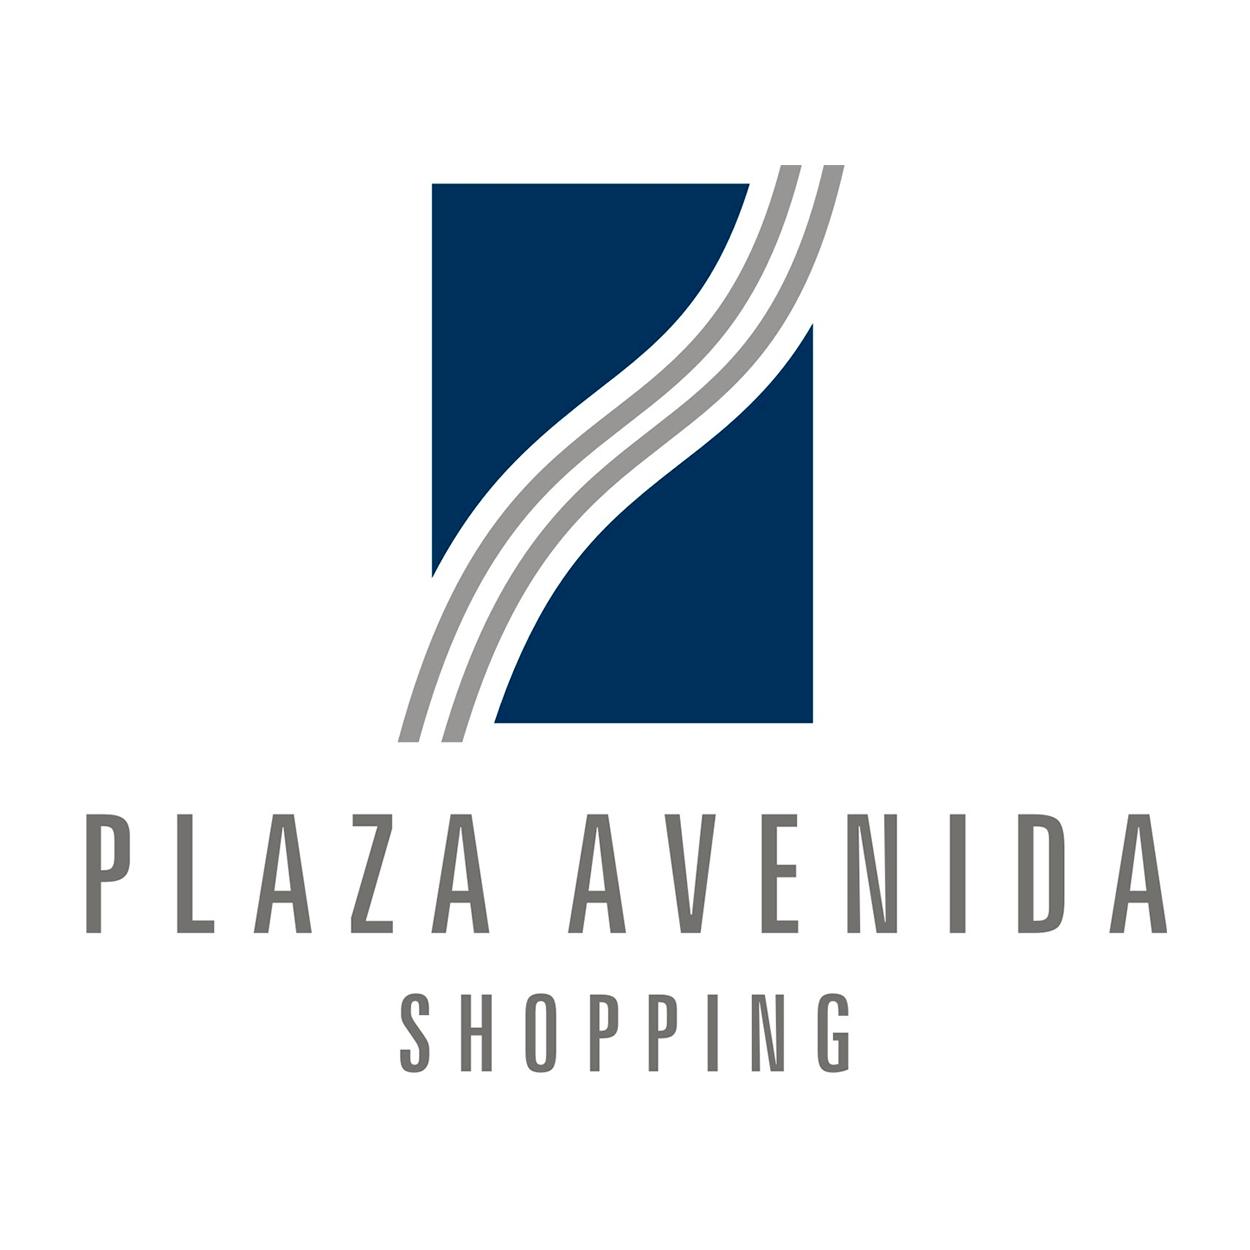 Plaza Avenida